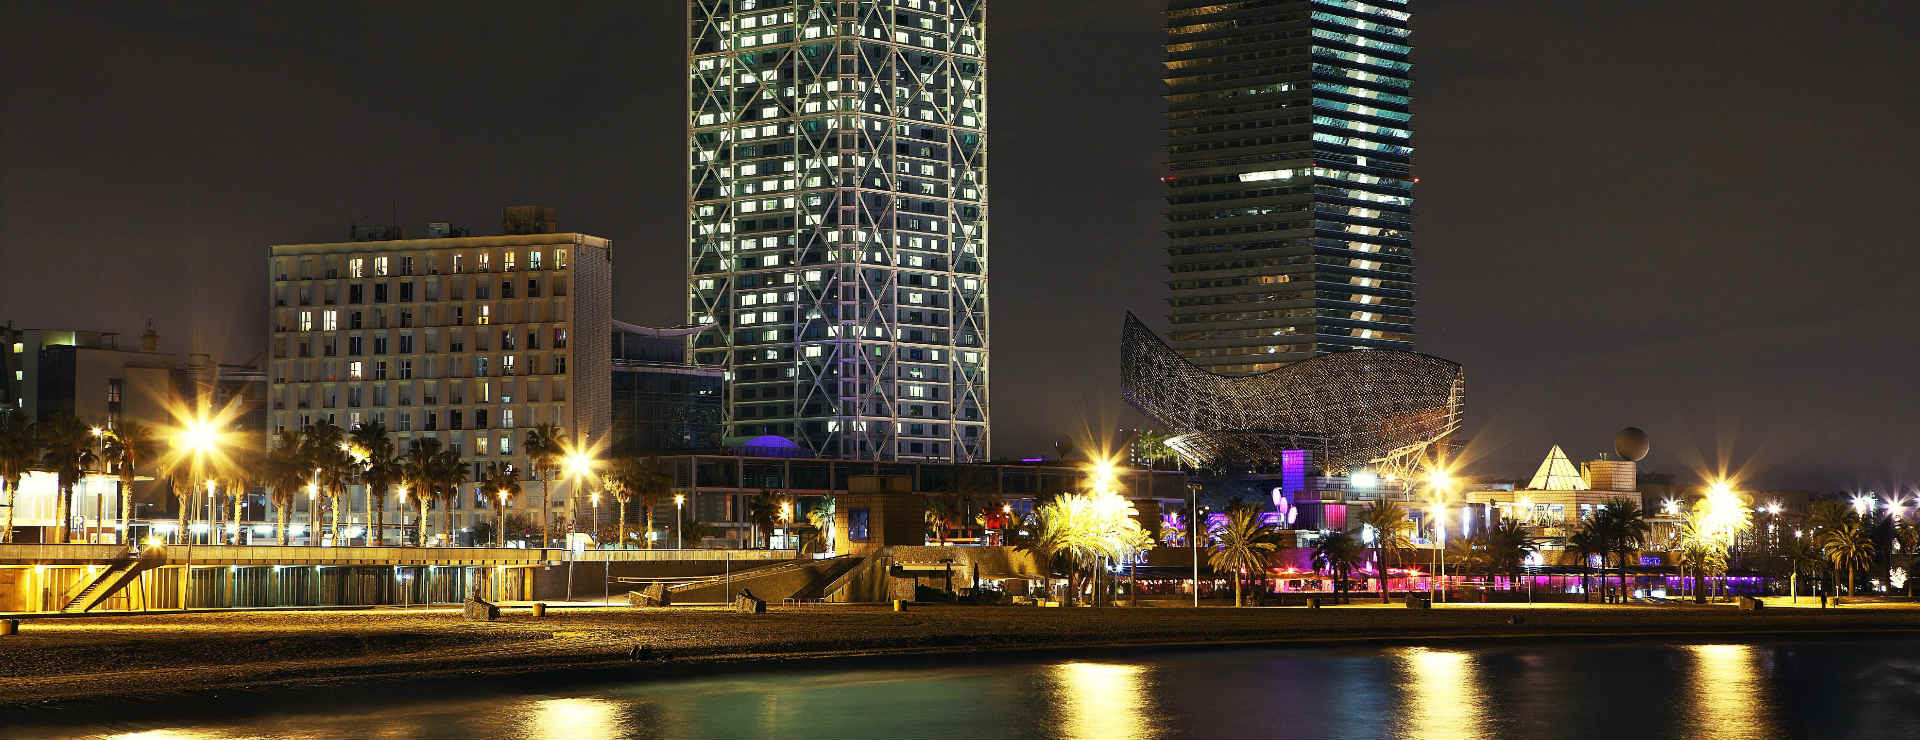 Barcelona for nightlife lovers